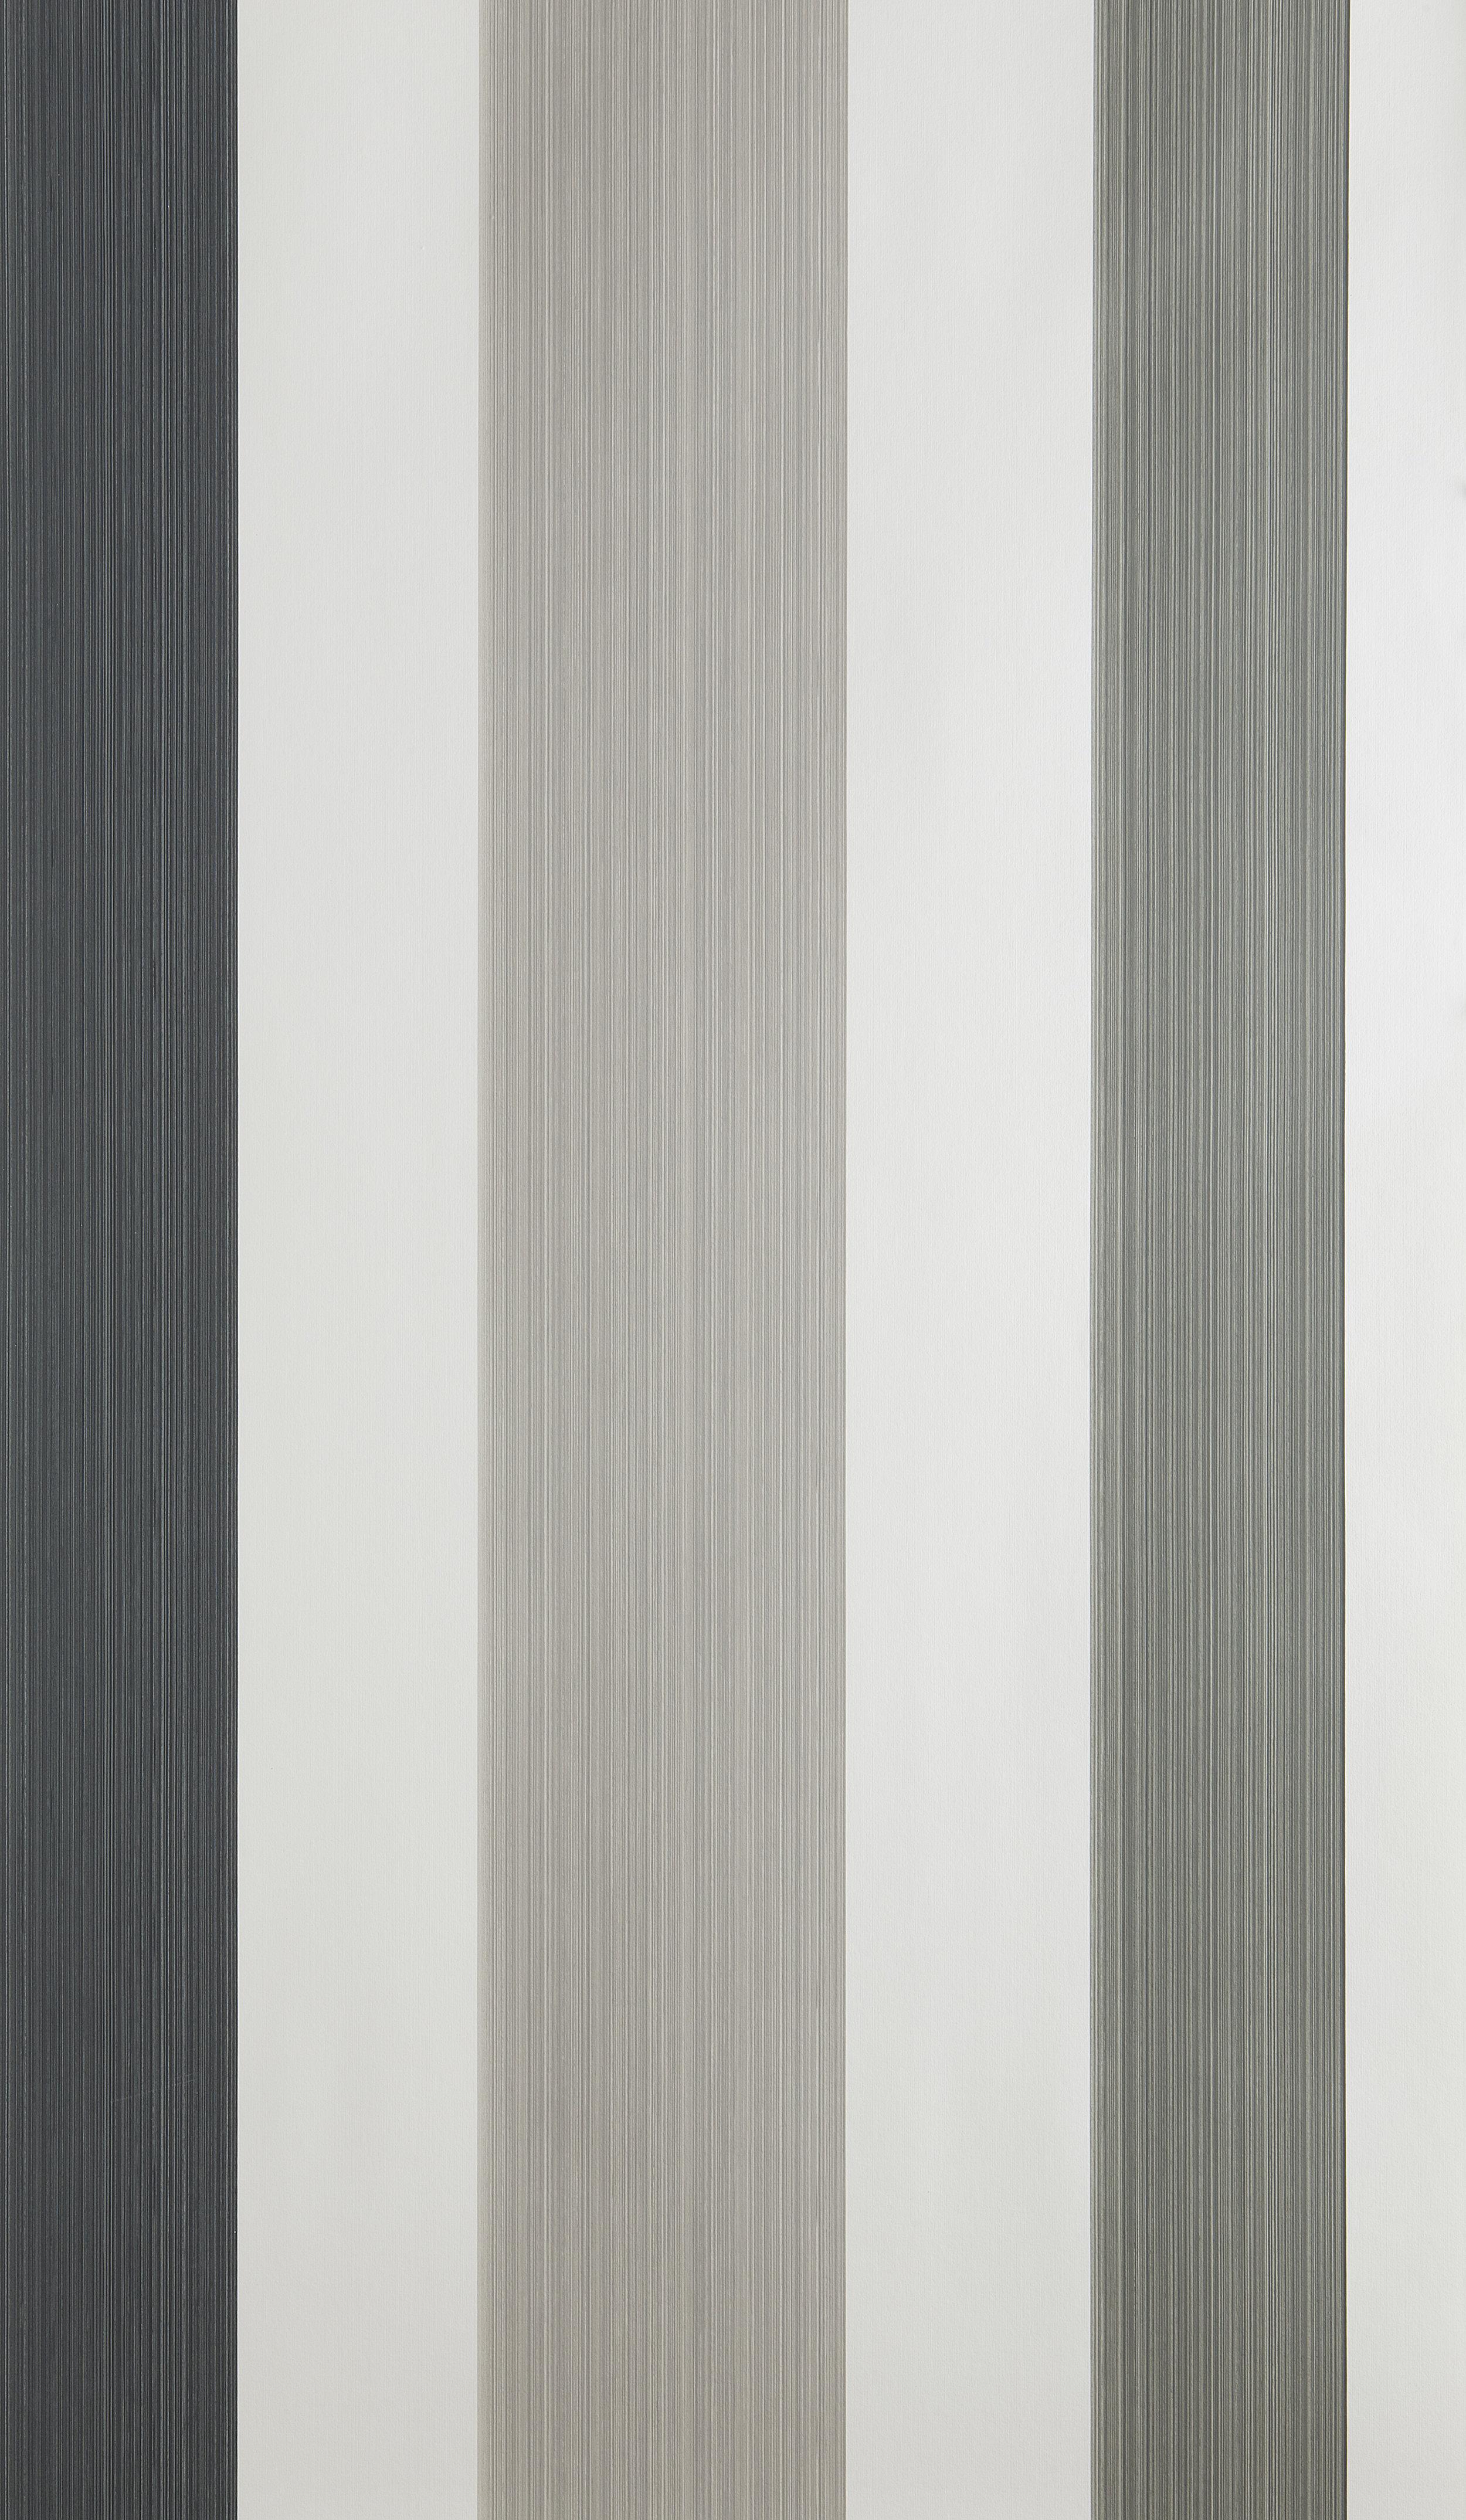 Chromatic Stripe 4201 $195 Per Roll  Order Now